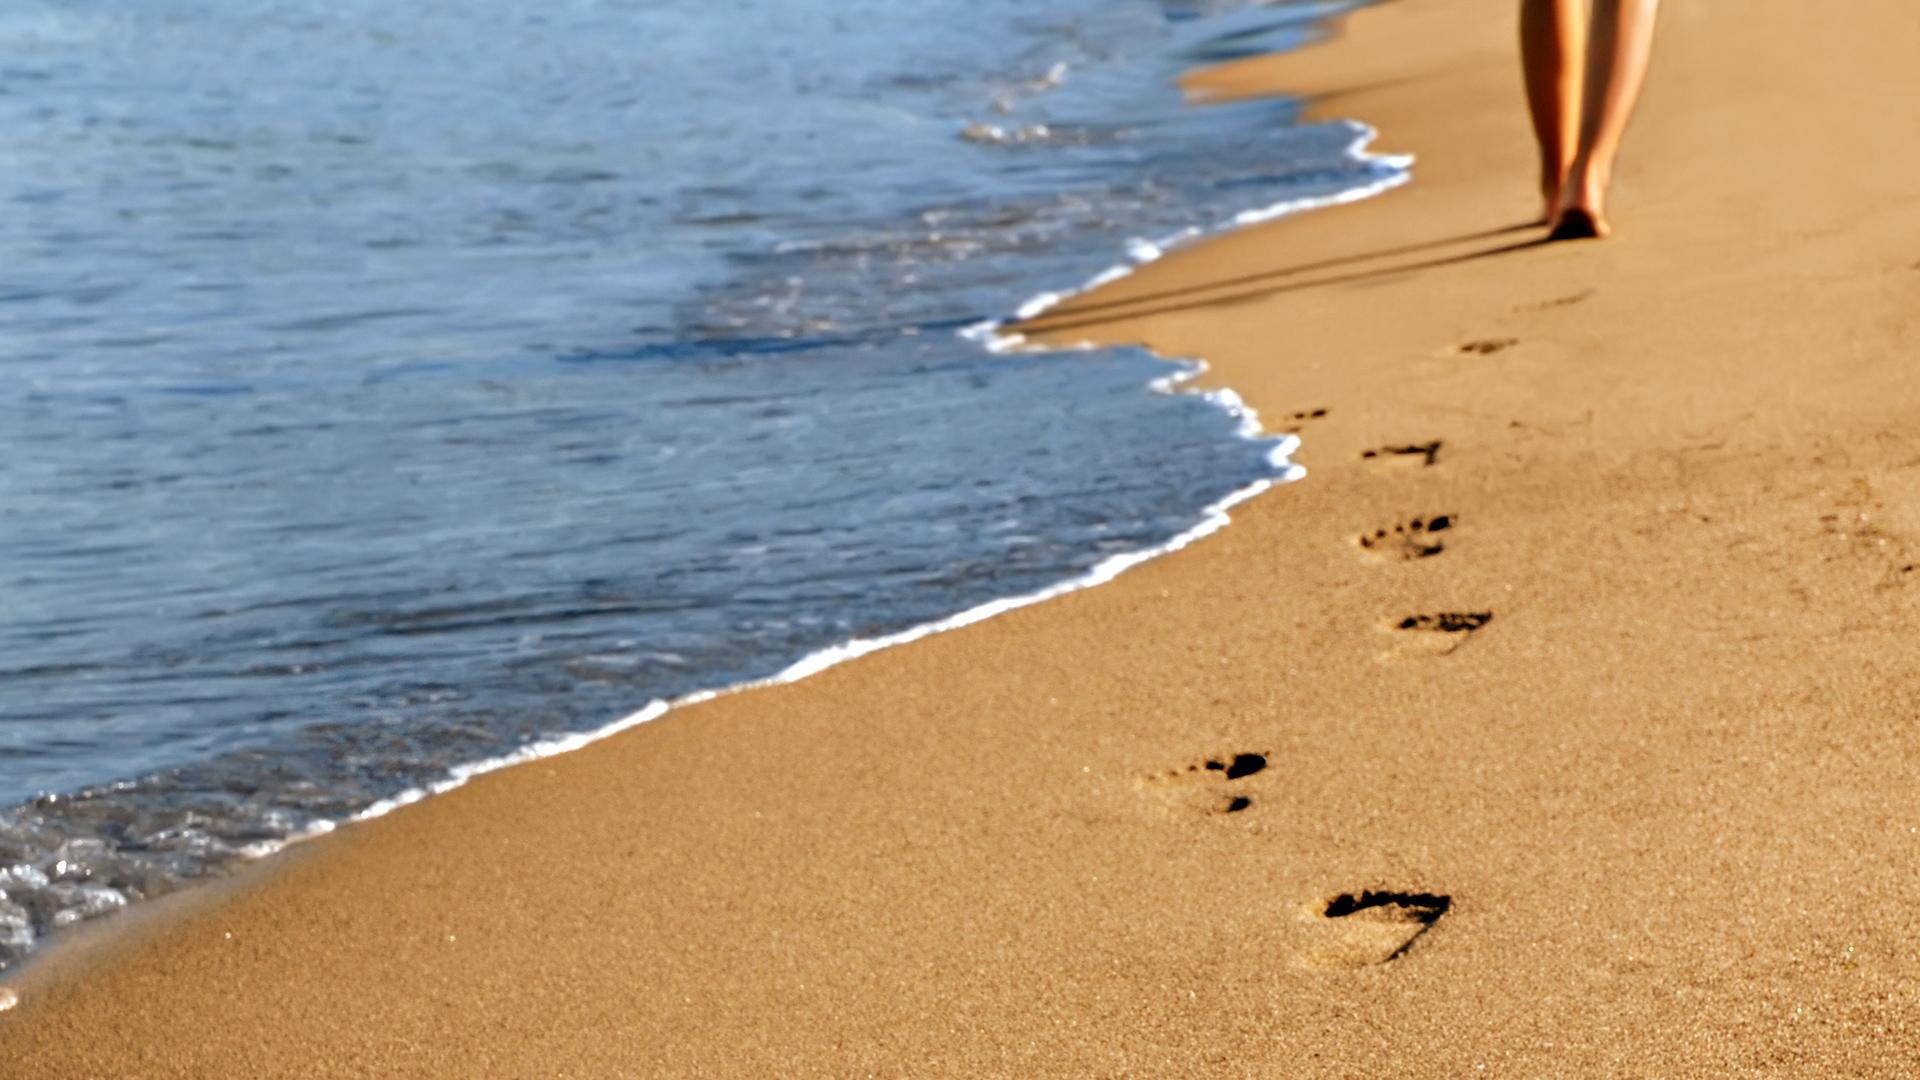 footprints in the sand by leona lewis sevenponds blogsevenponds blog